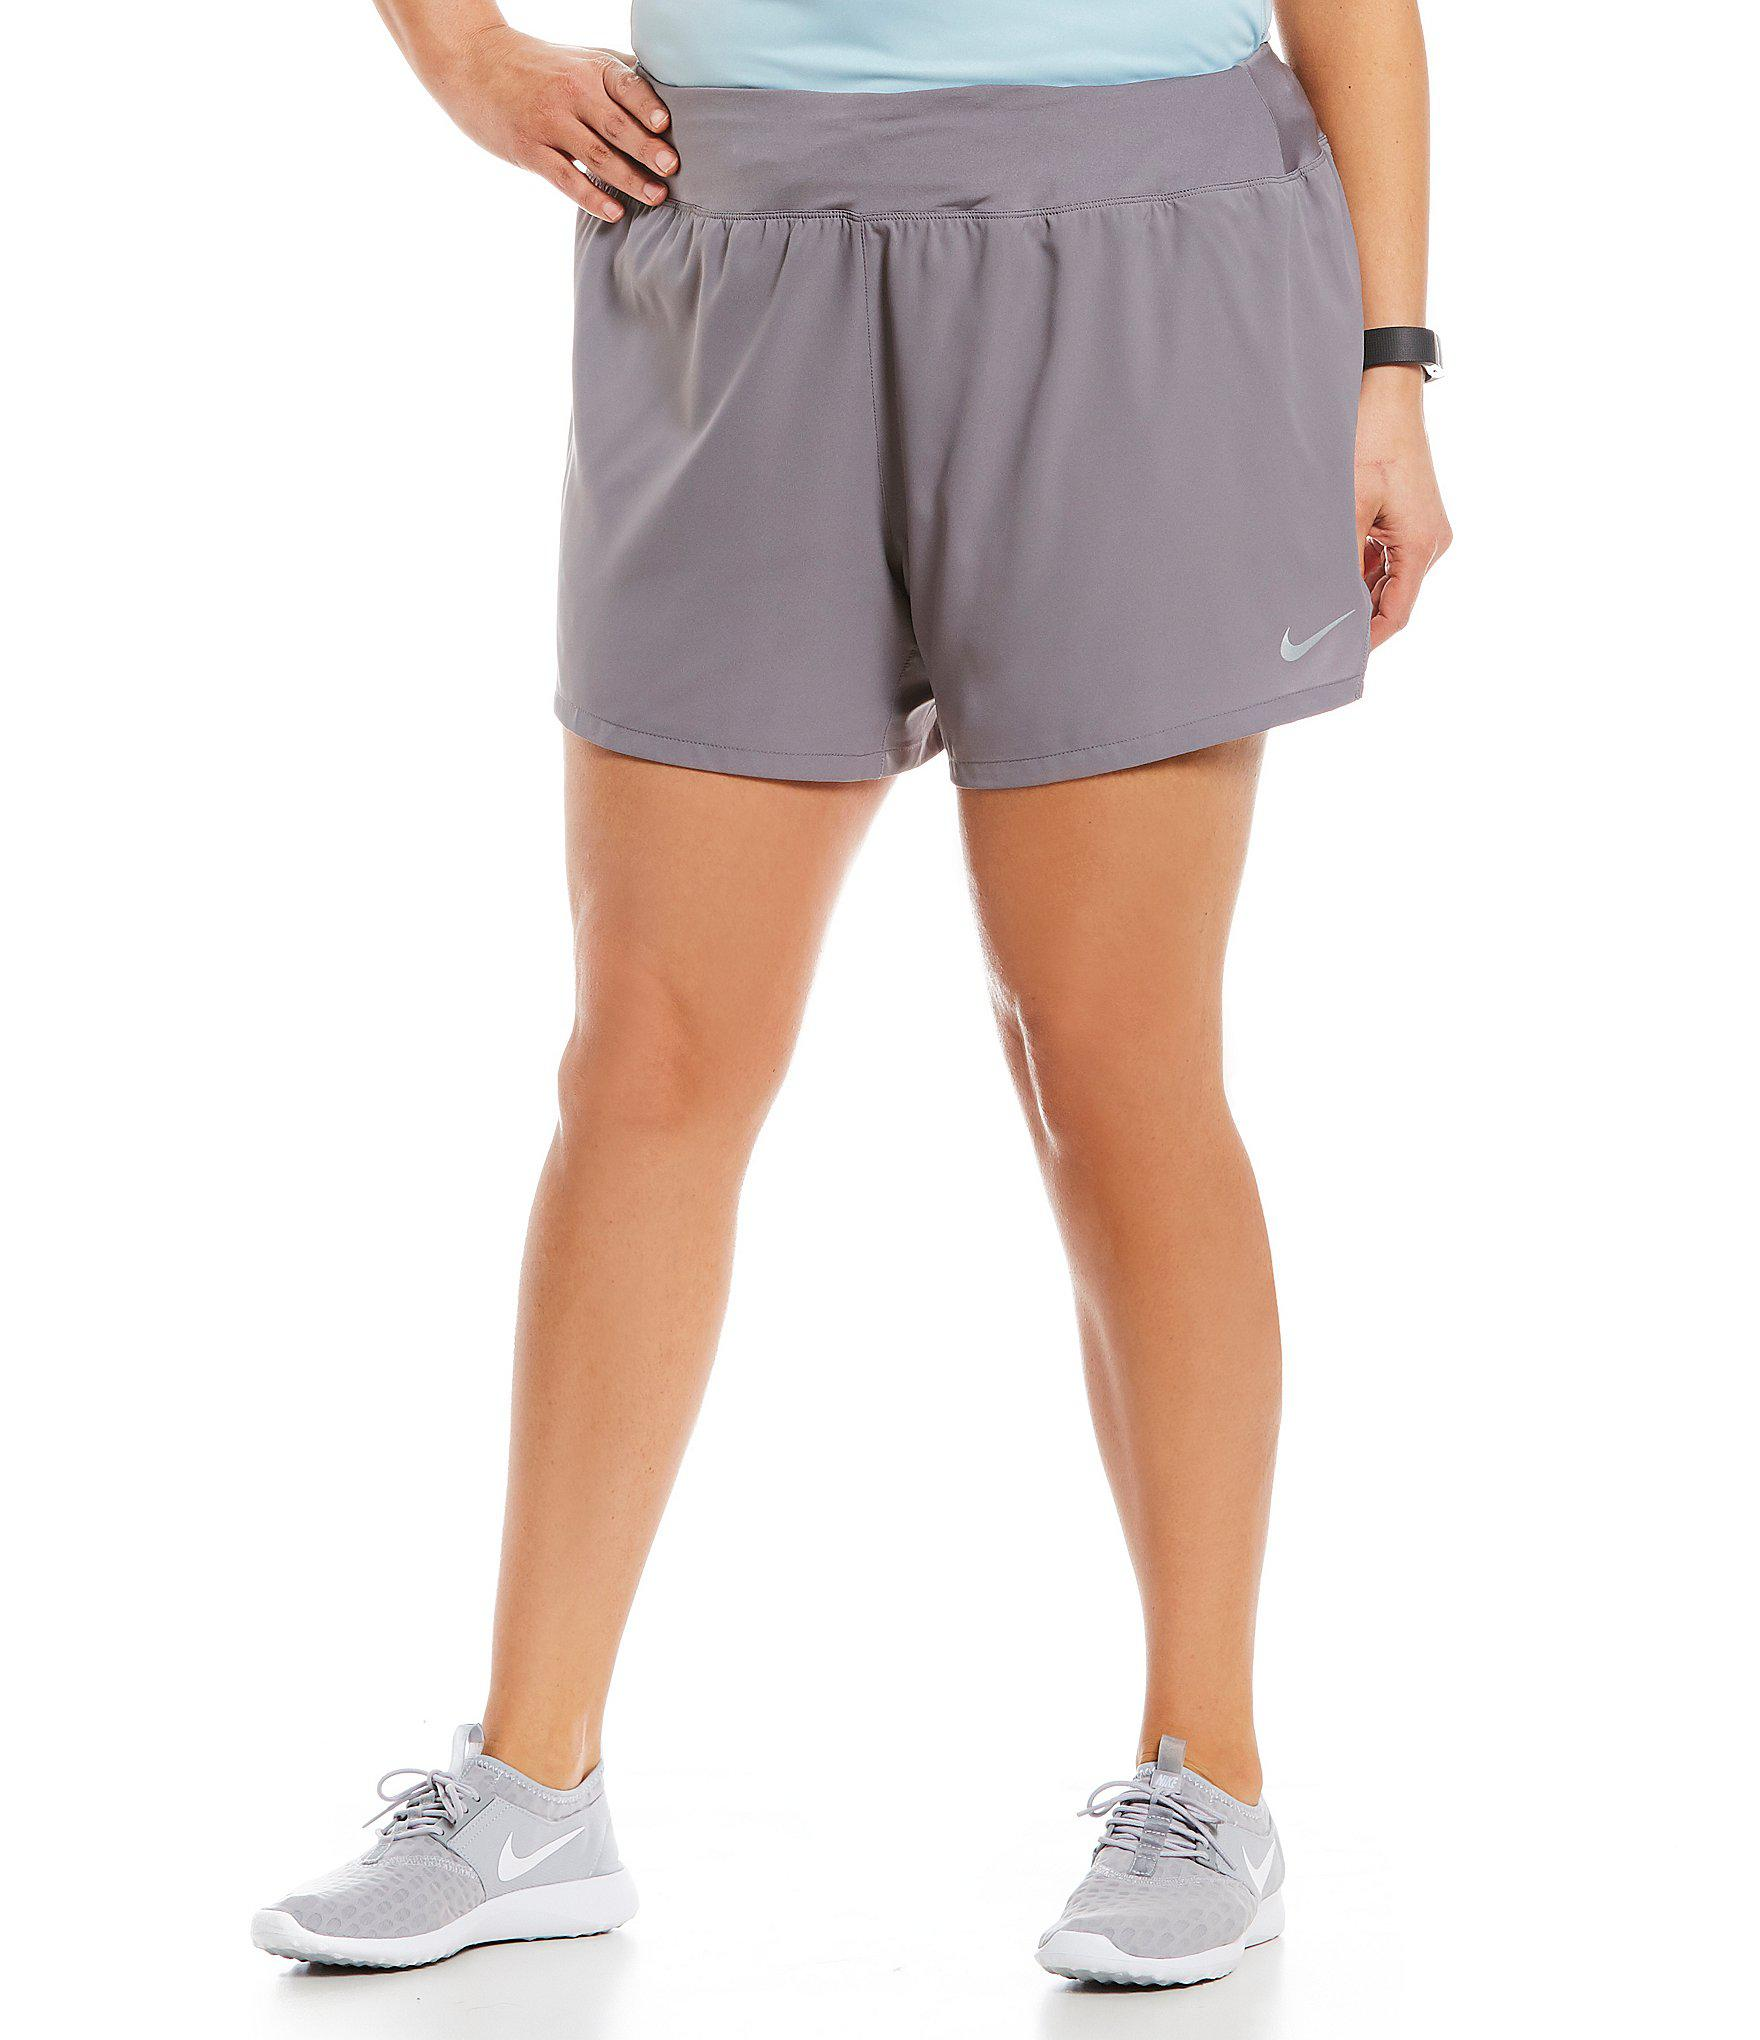 84d6e3c69fe4 Lyst - Nike Flex Running Shorts in Gray